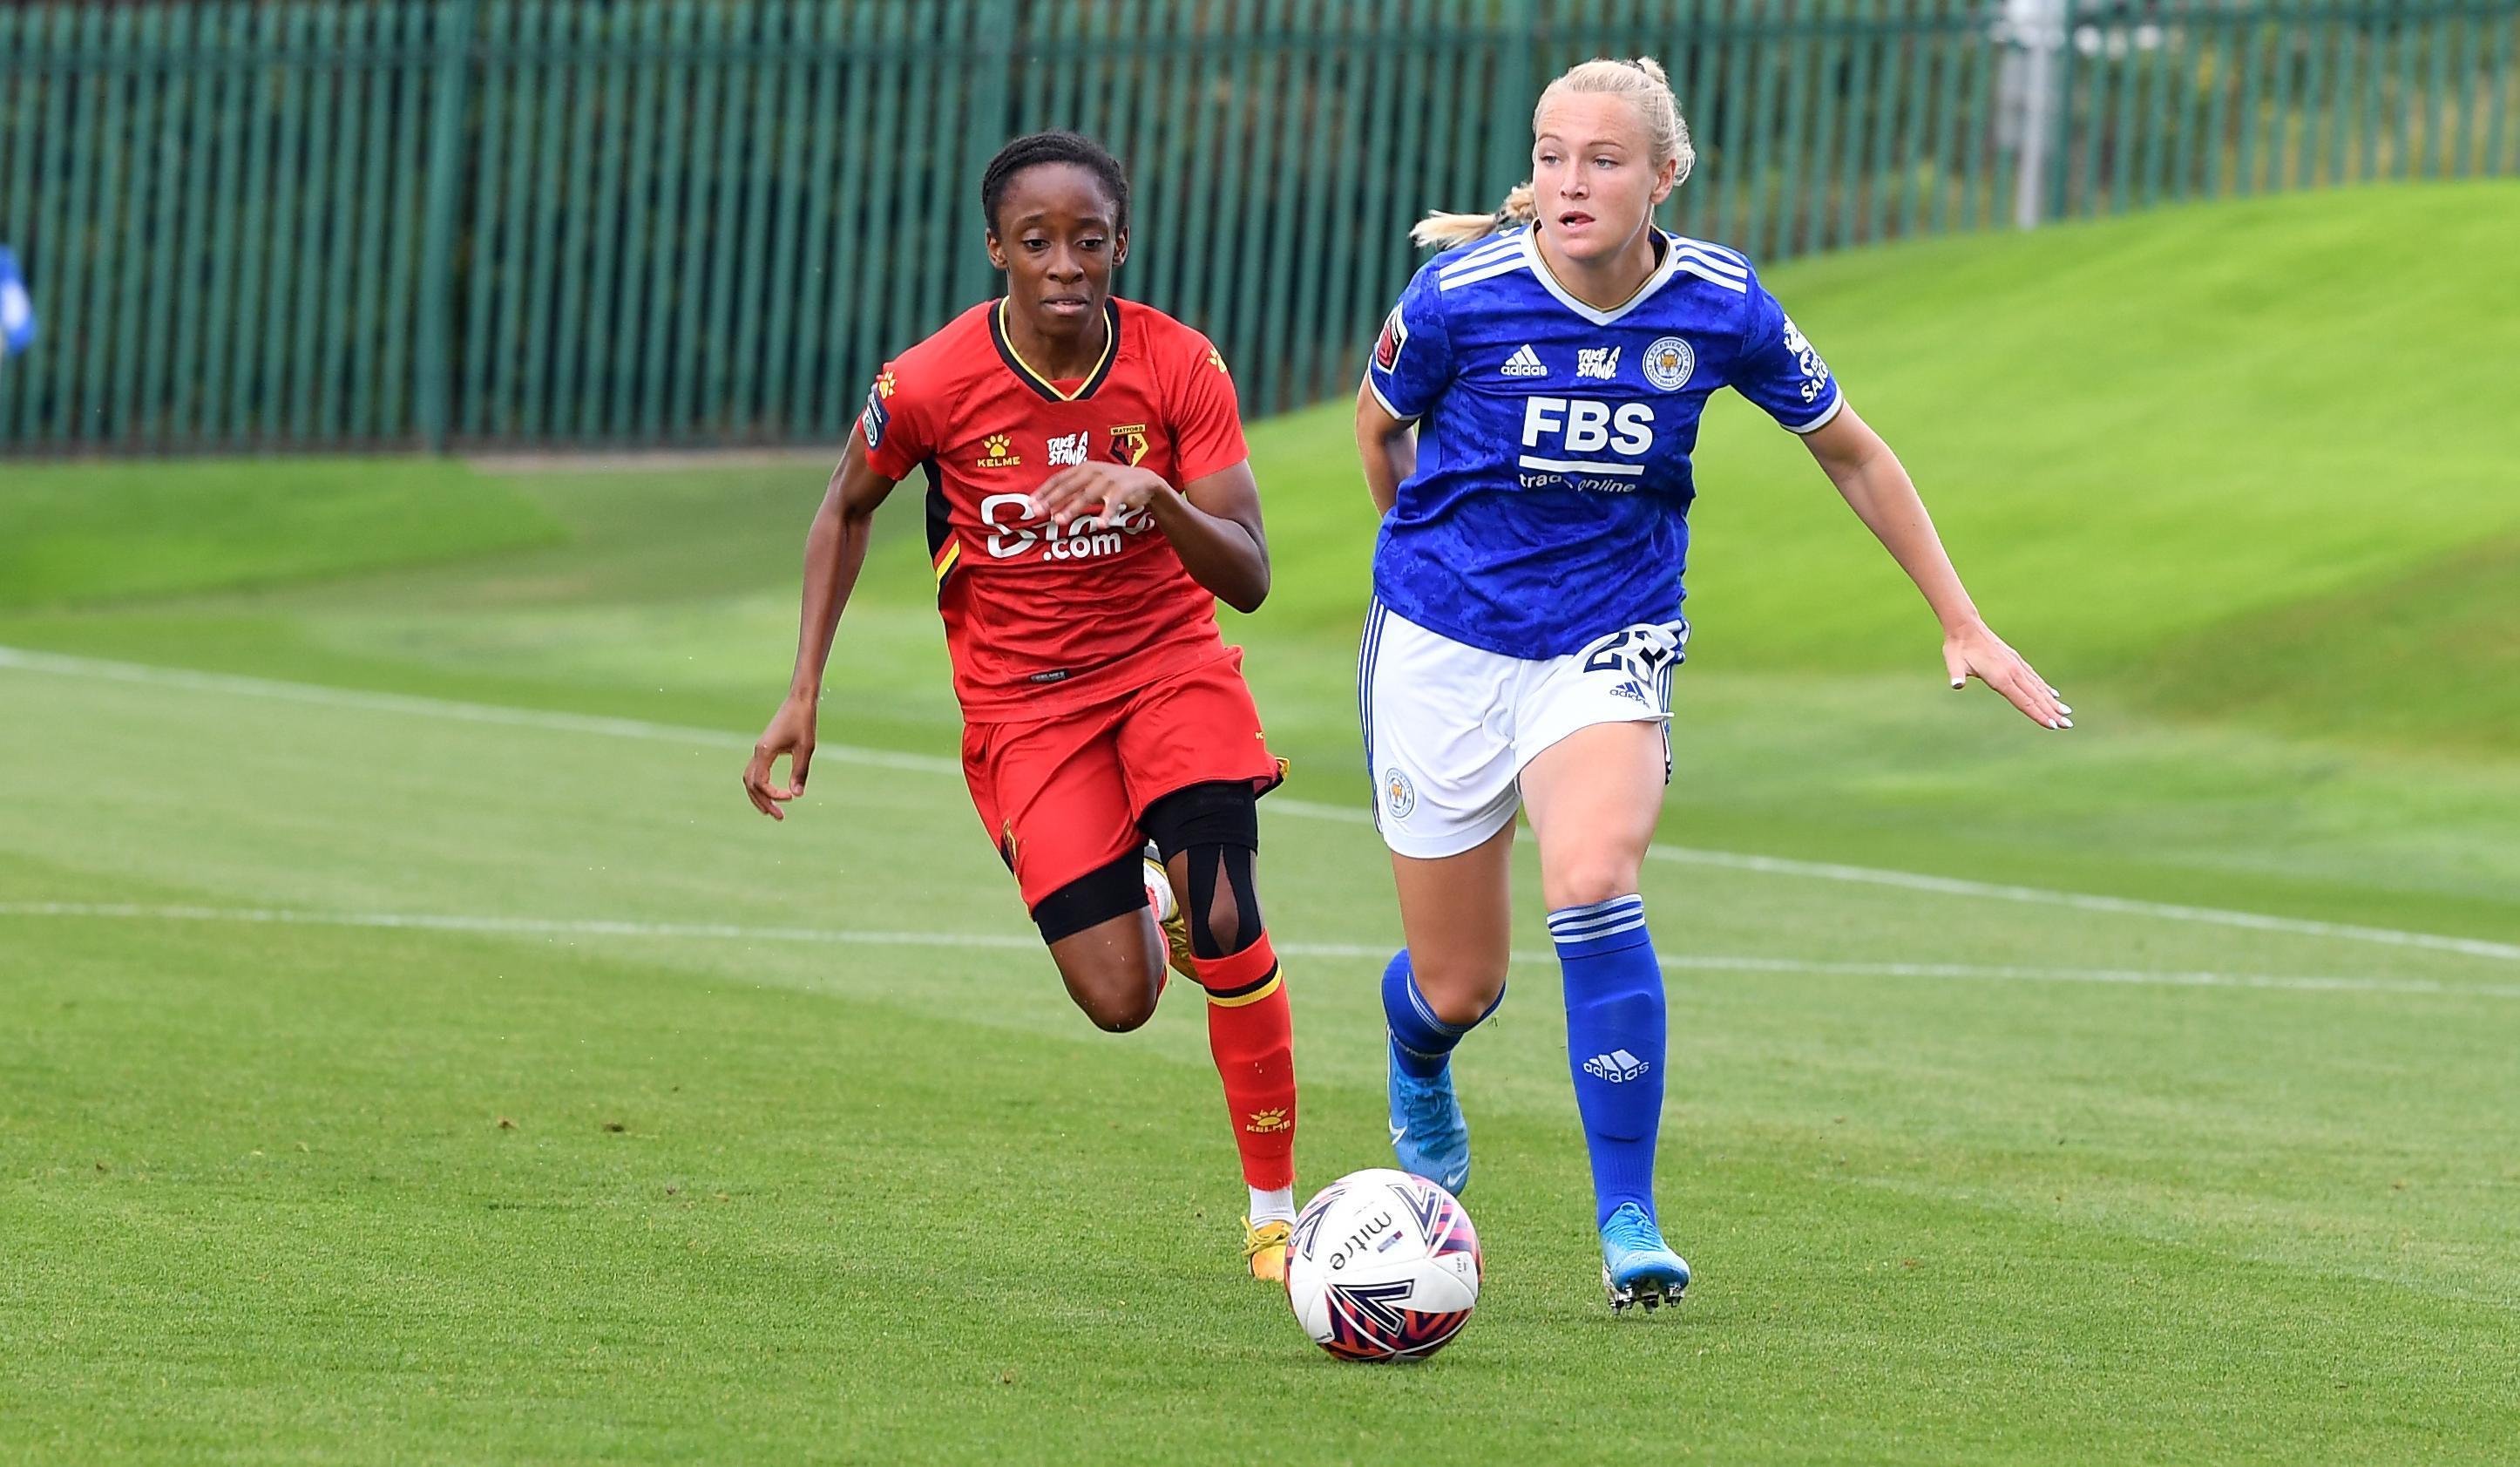 LCFC Women Face Watford In Pre-Season Encounter